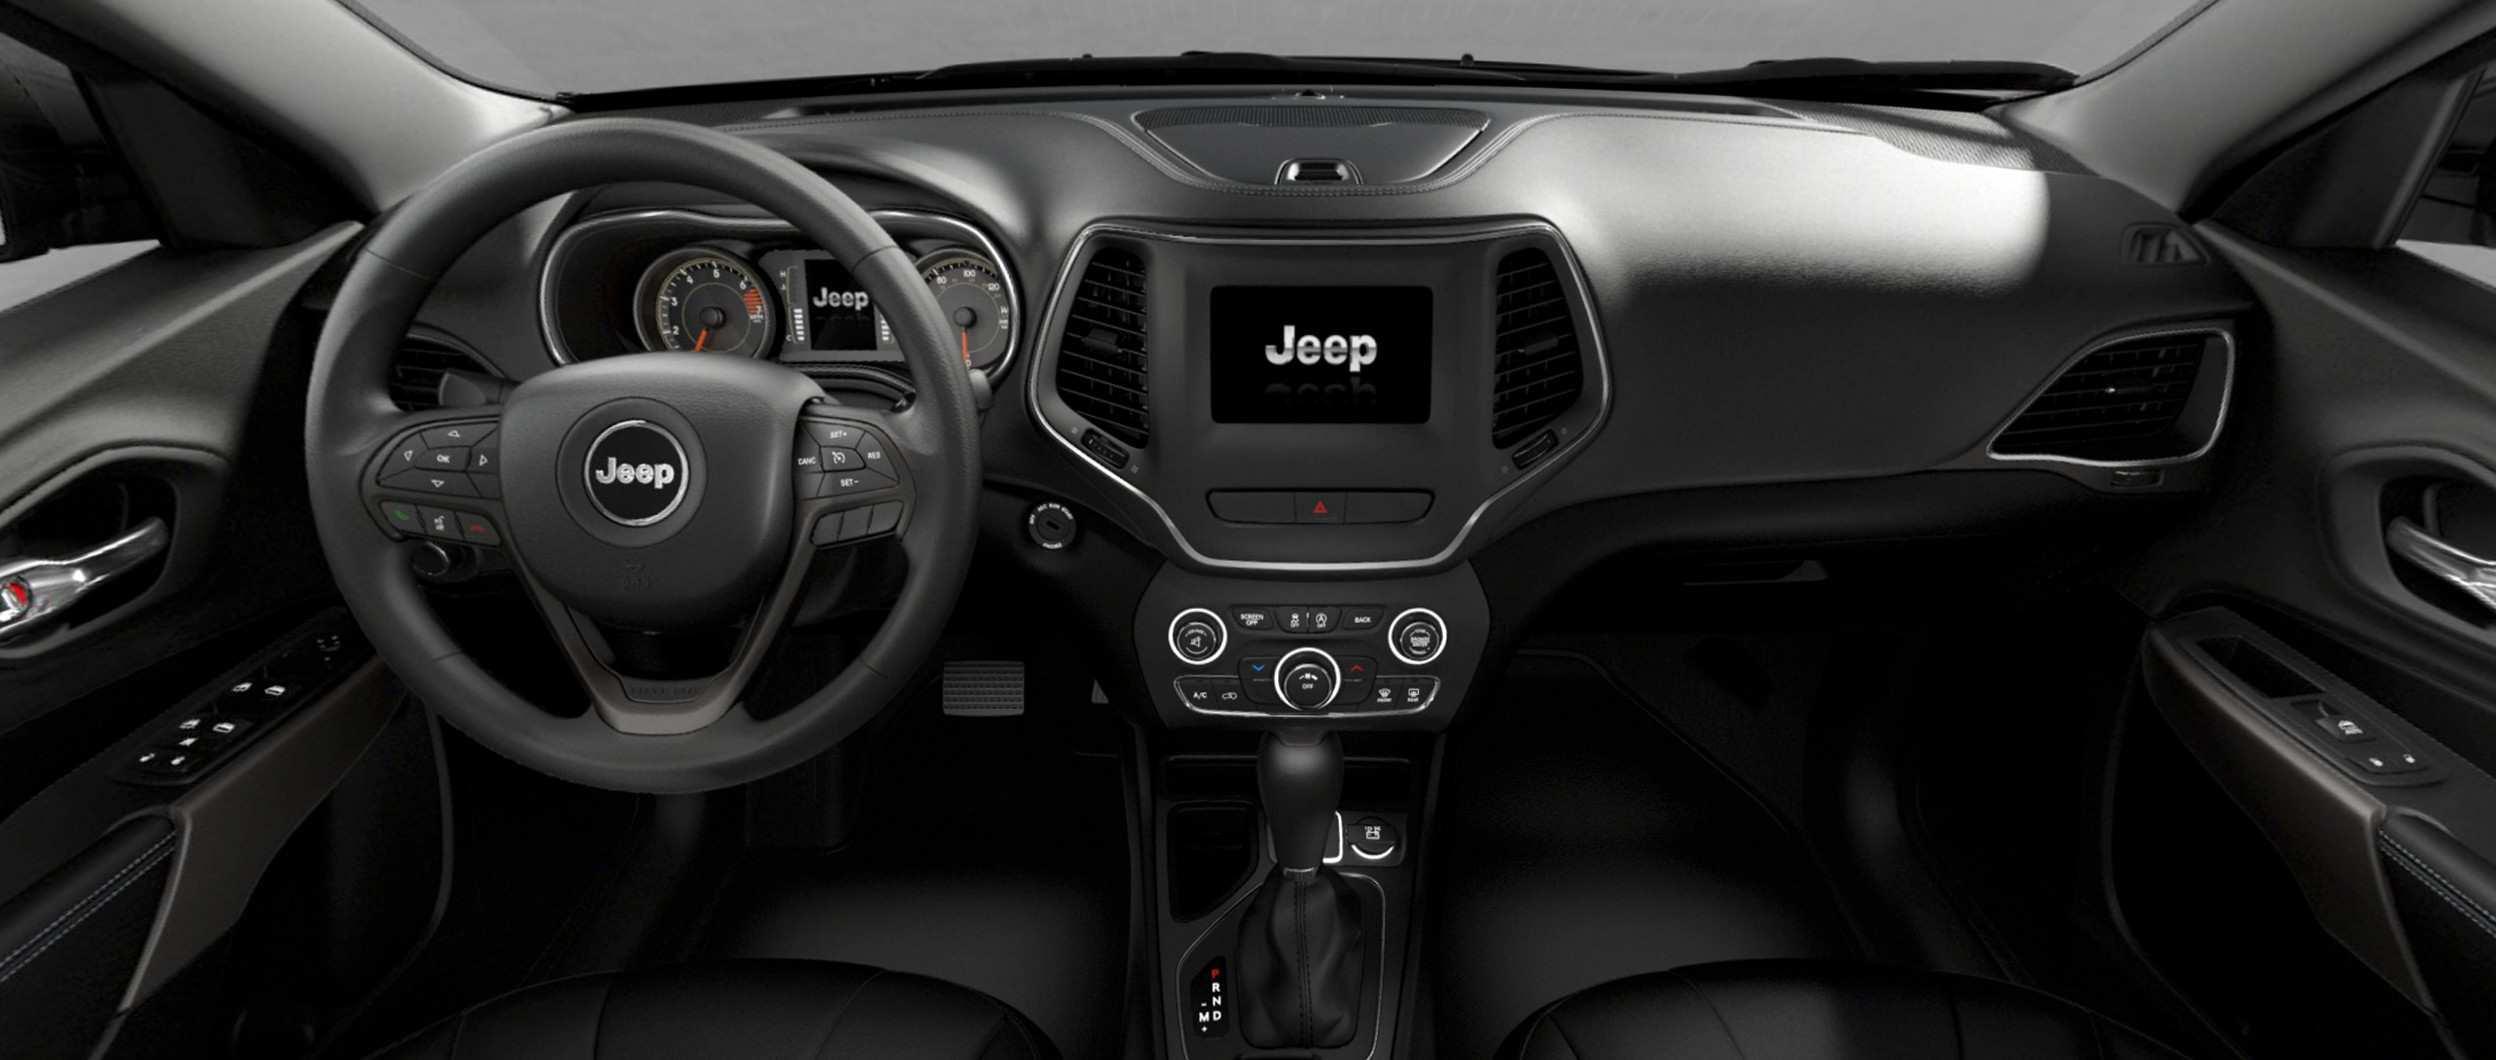 57 All New 2019 Jeep Cherokee Interior Model for 2019 Jeep Cherokee Interior